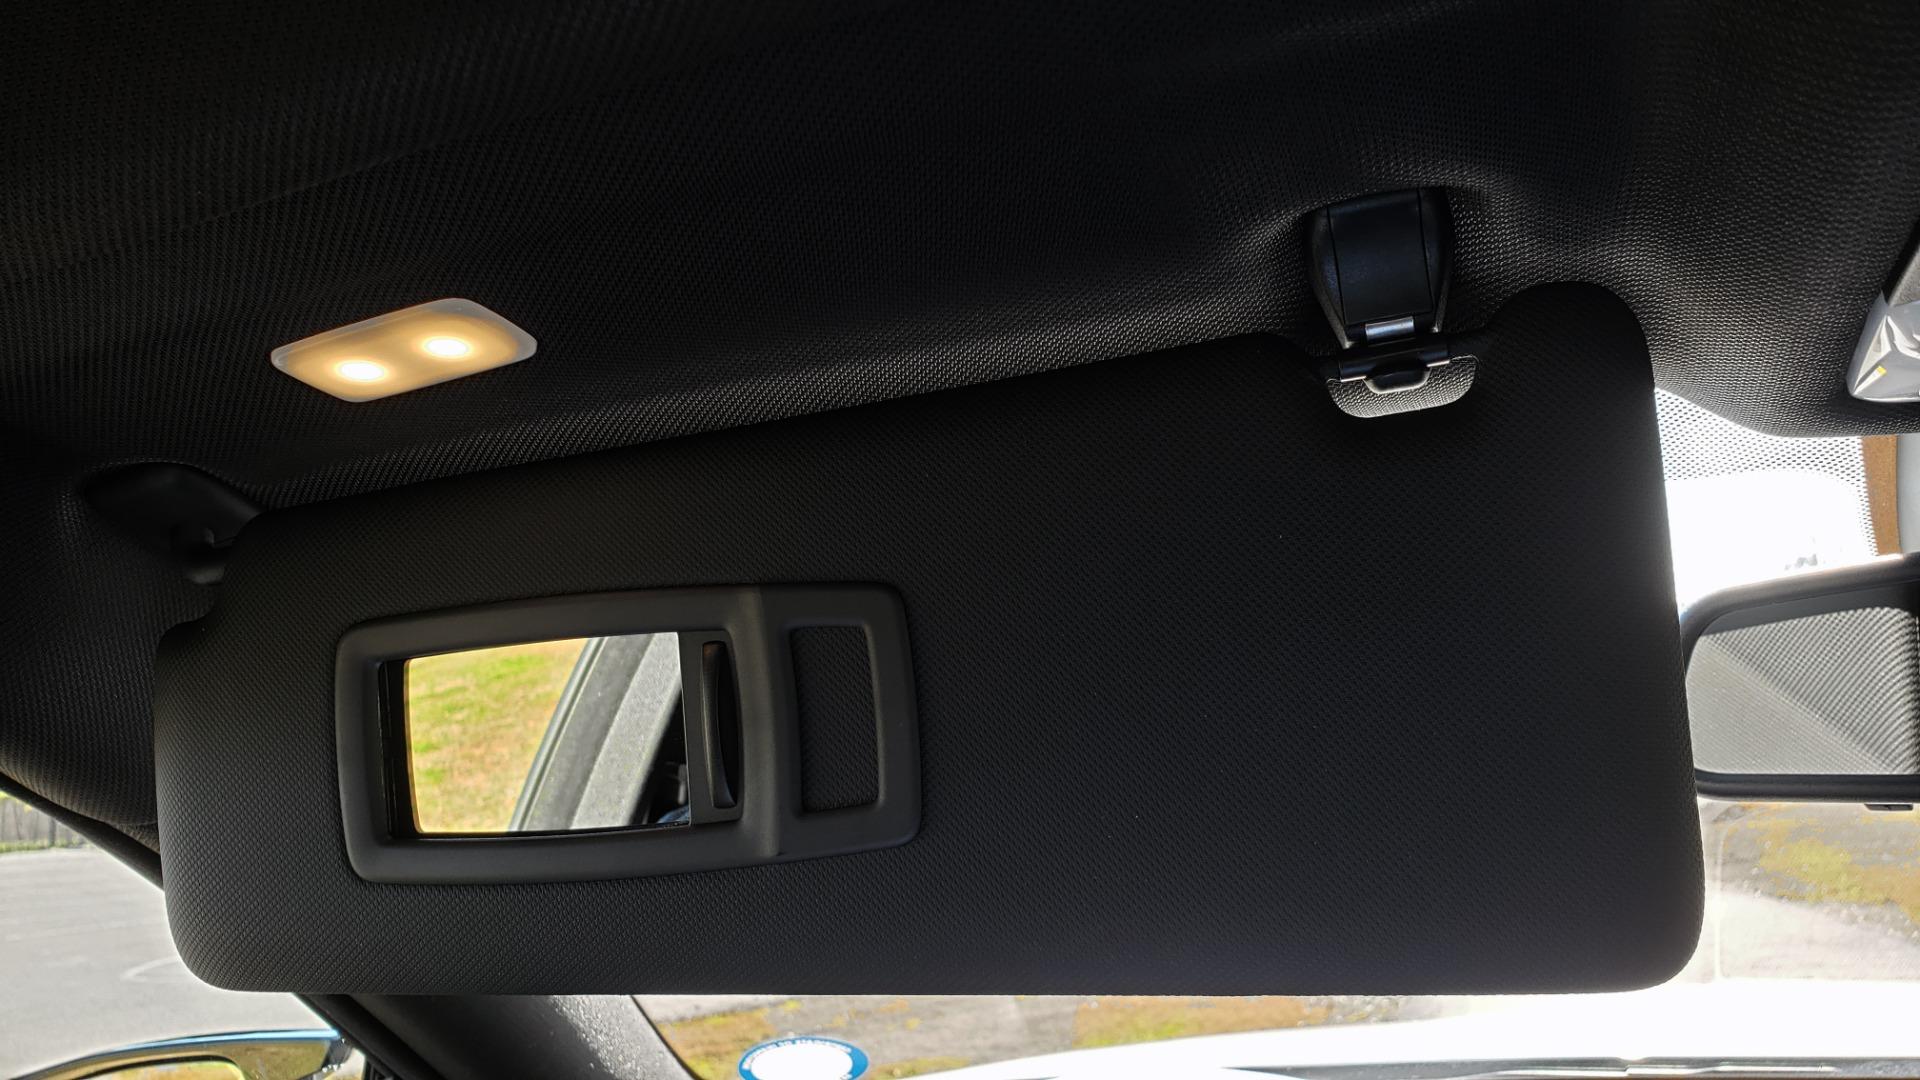 Used 2018 BMW M4 COMP PKG / EXEC / M-DRIVER / PARK CNTRL / ACTIVE BLIND SPOT for sale $45,449 at Formula Imports in Charlotte NC 28227 56